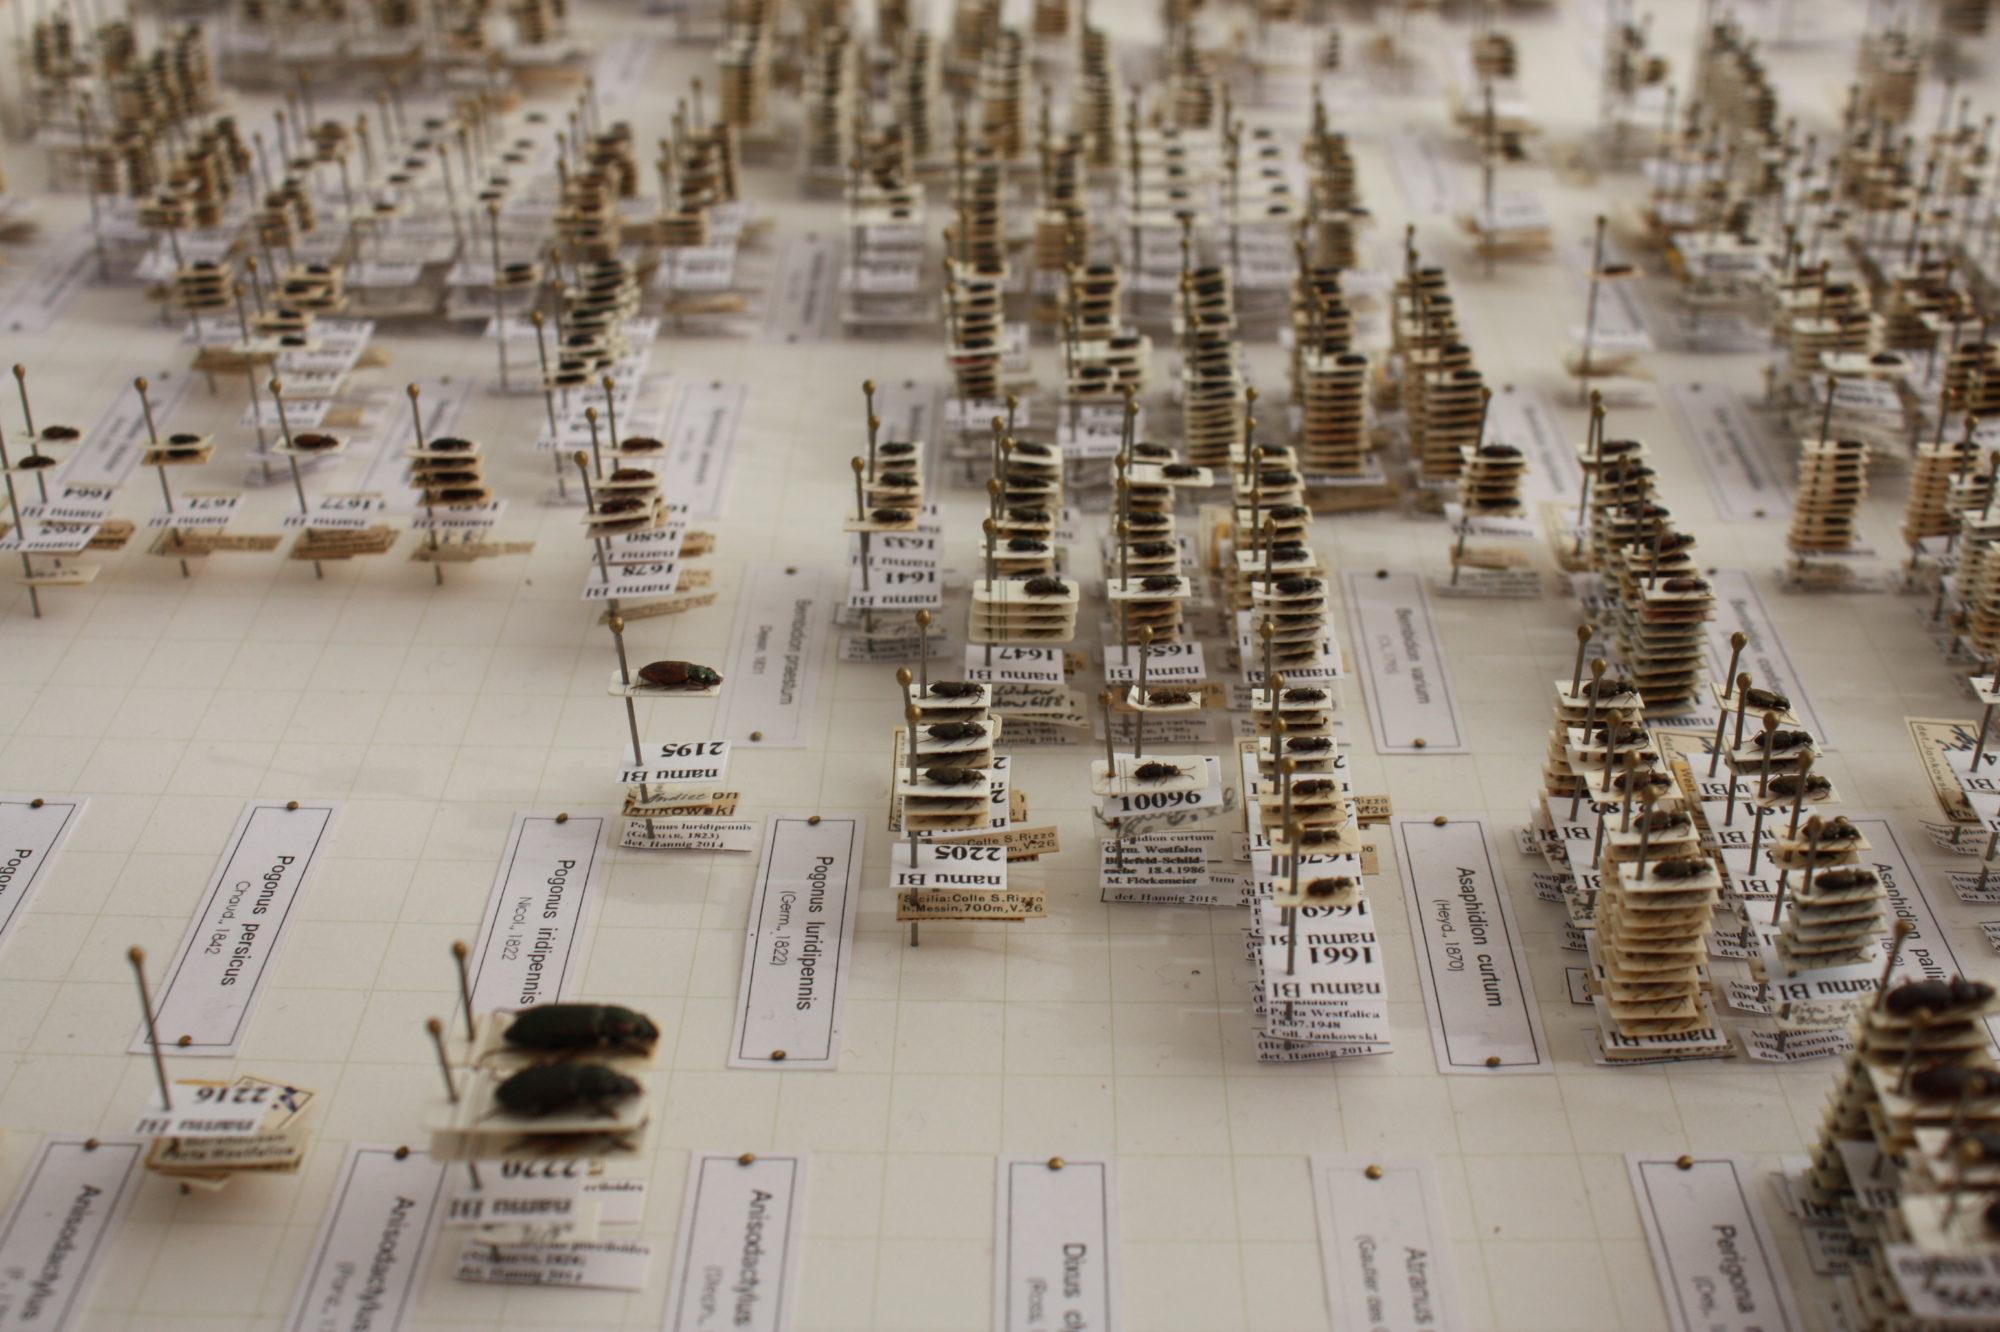 Käfersammlung